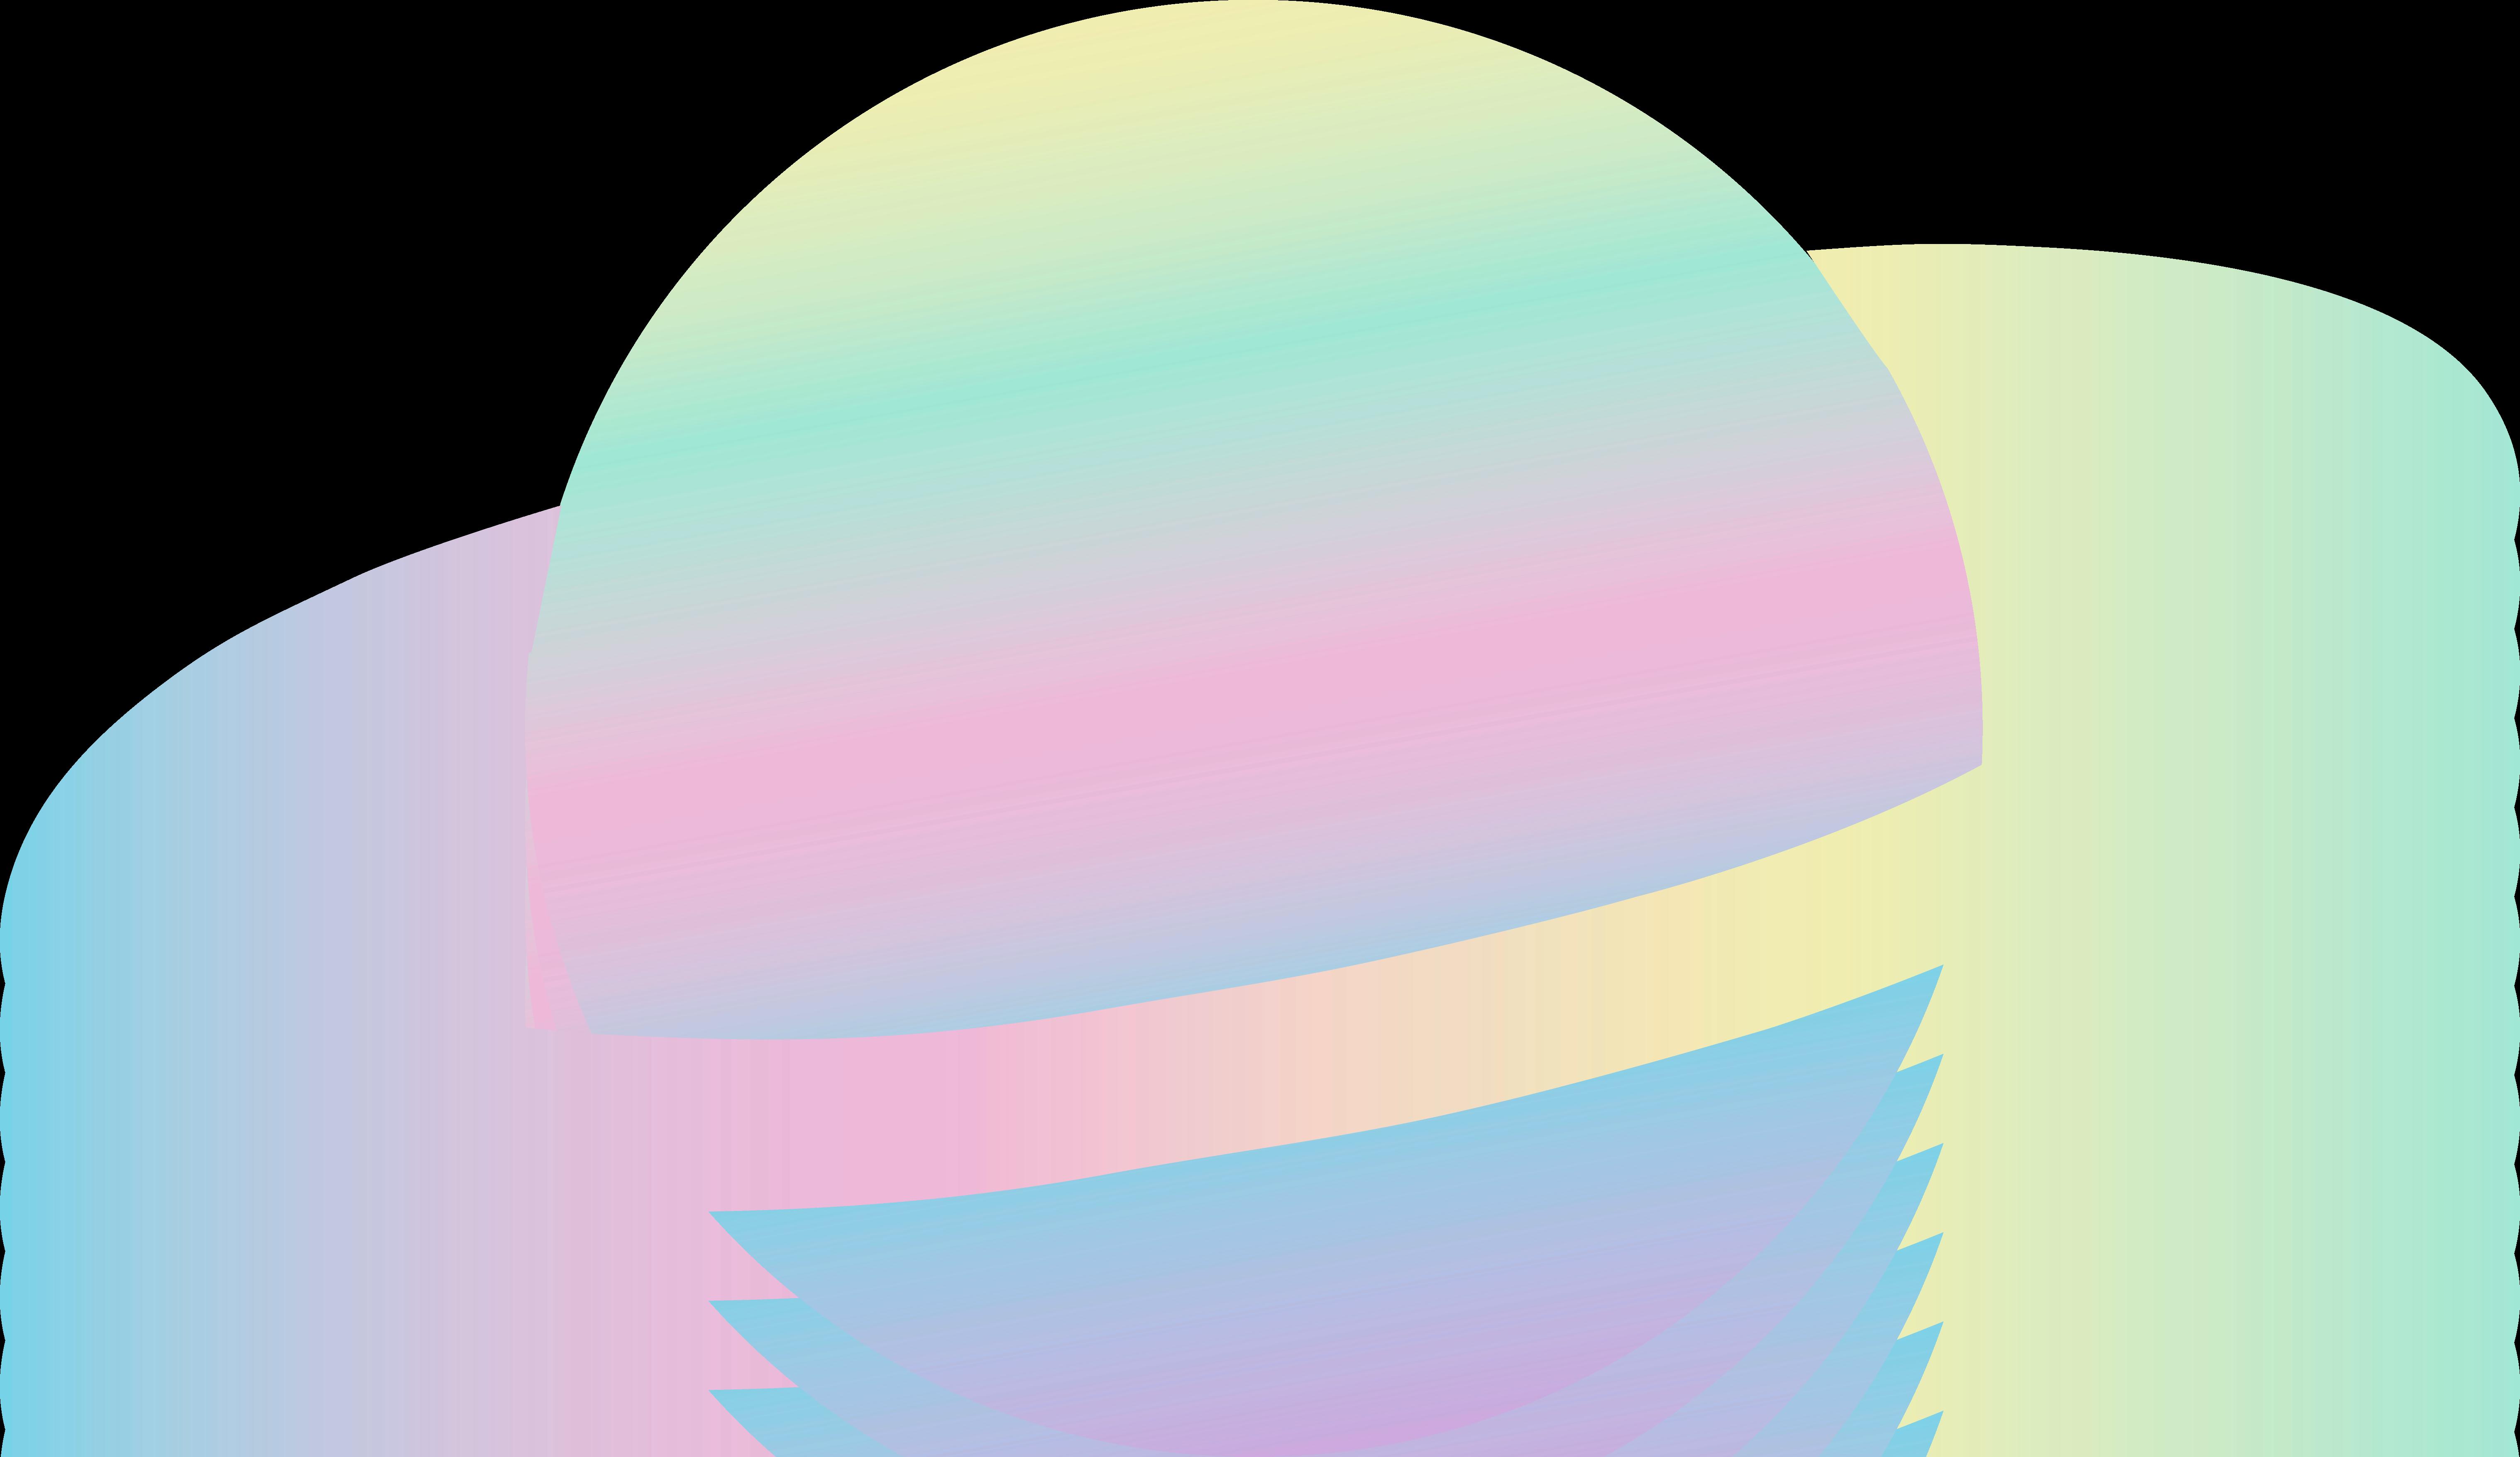 6071x3511 Space Clipart Cartoon Planet